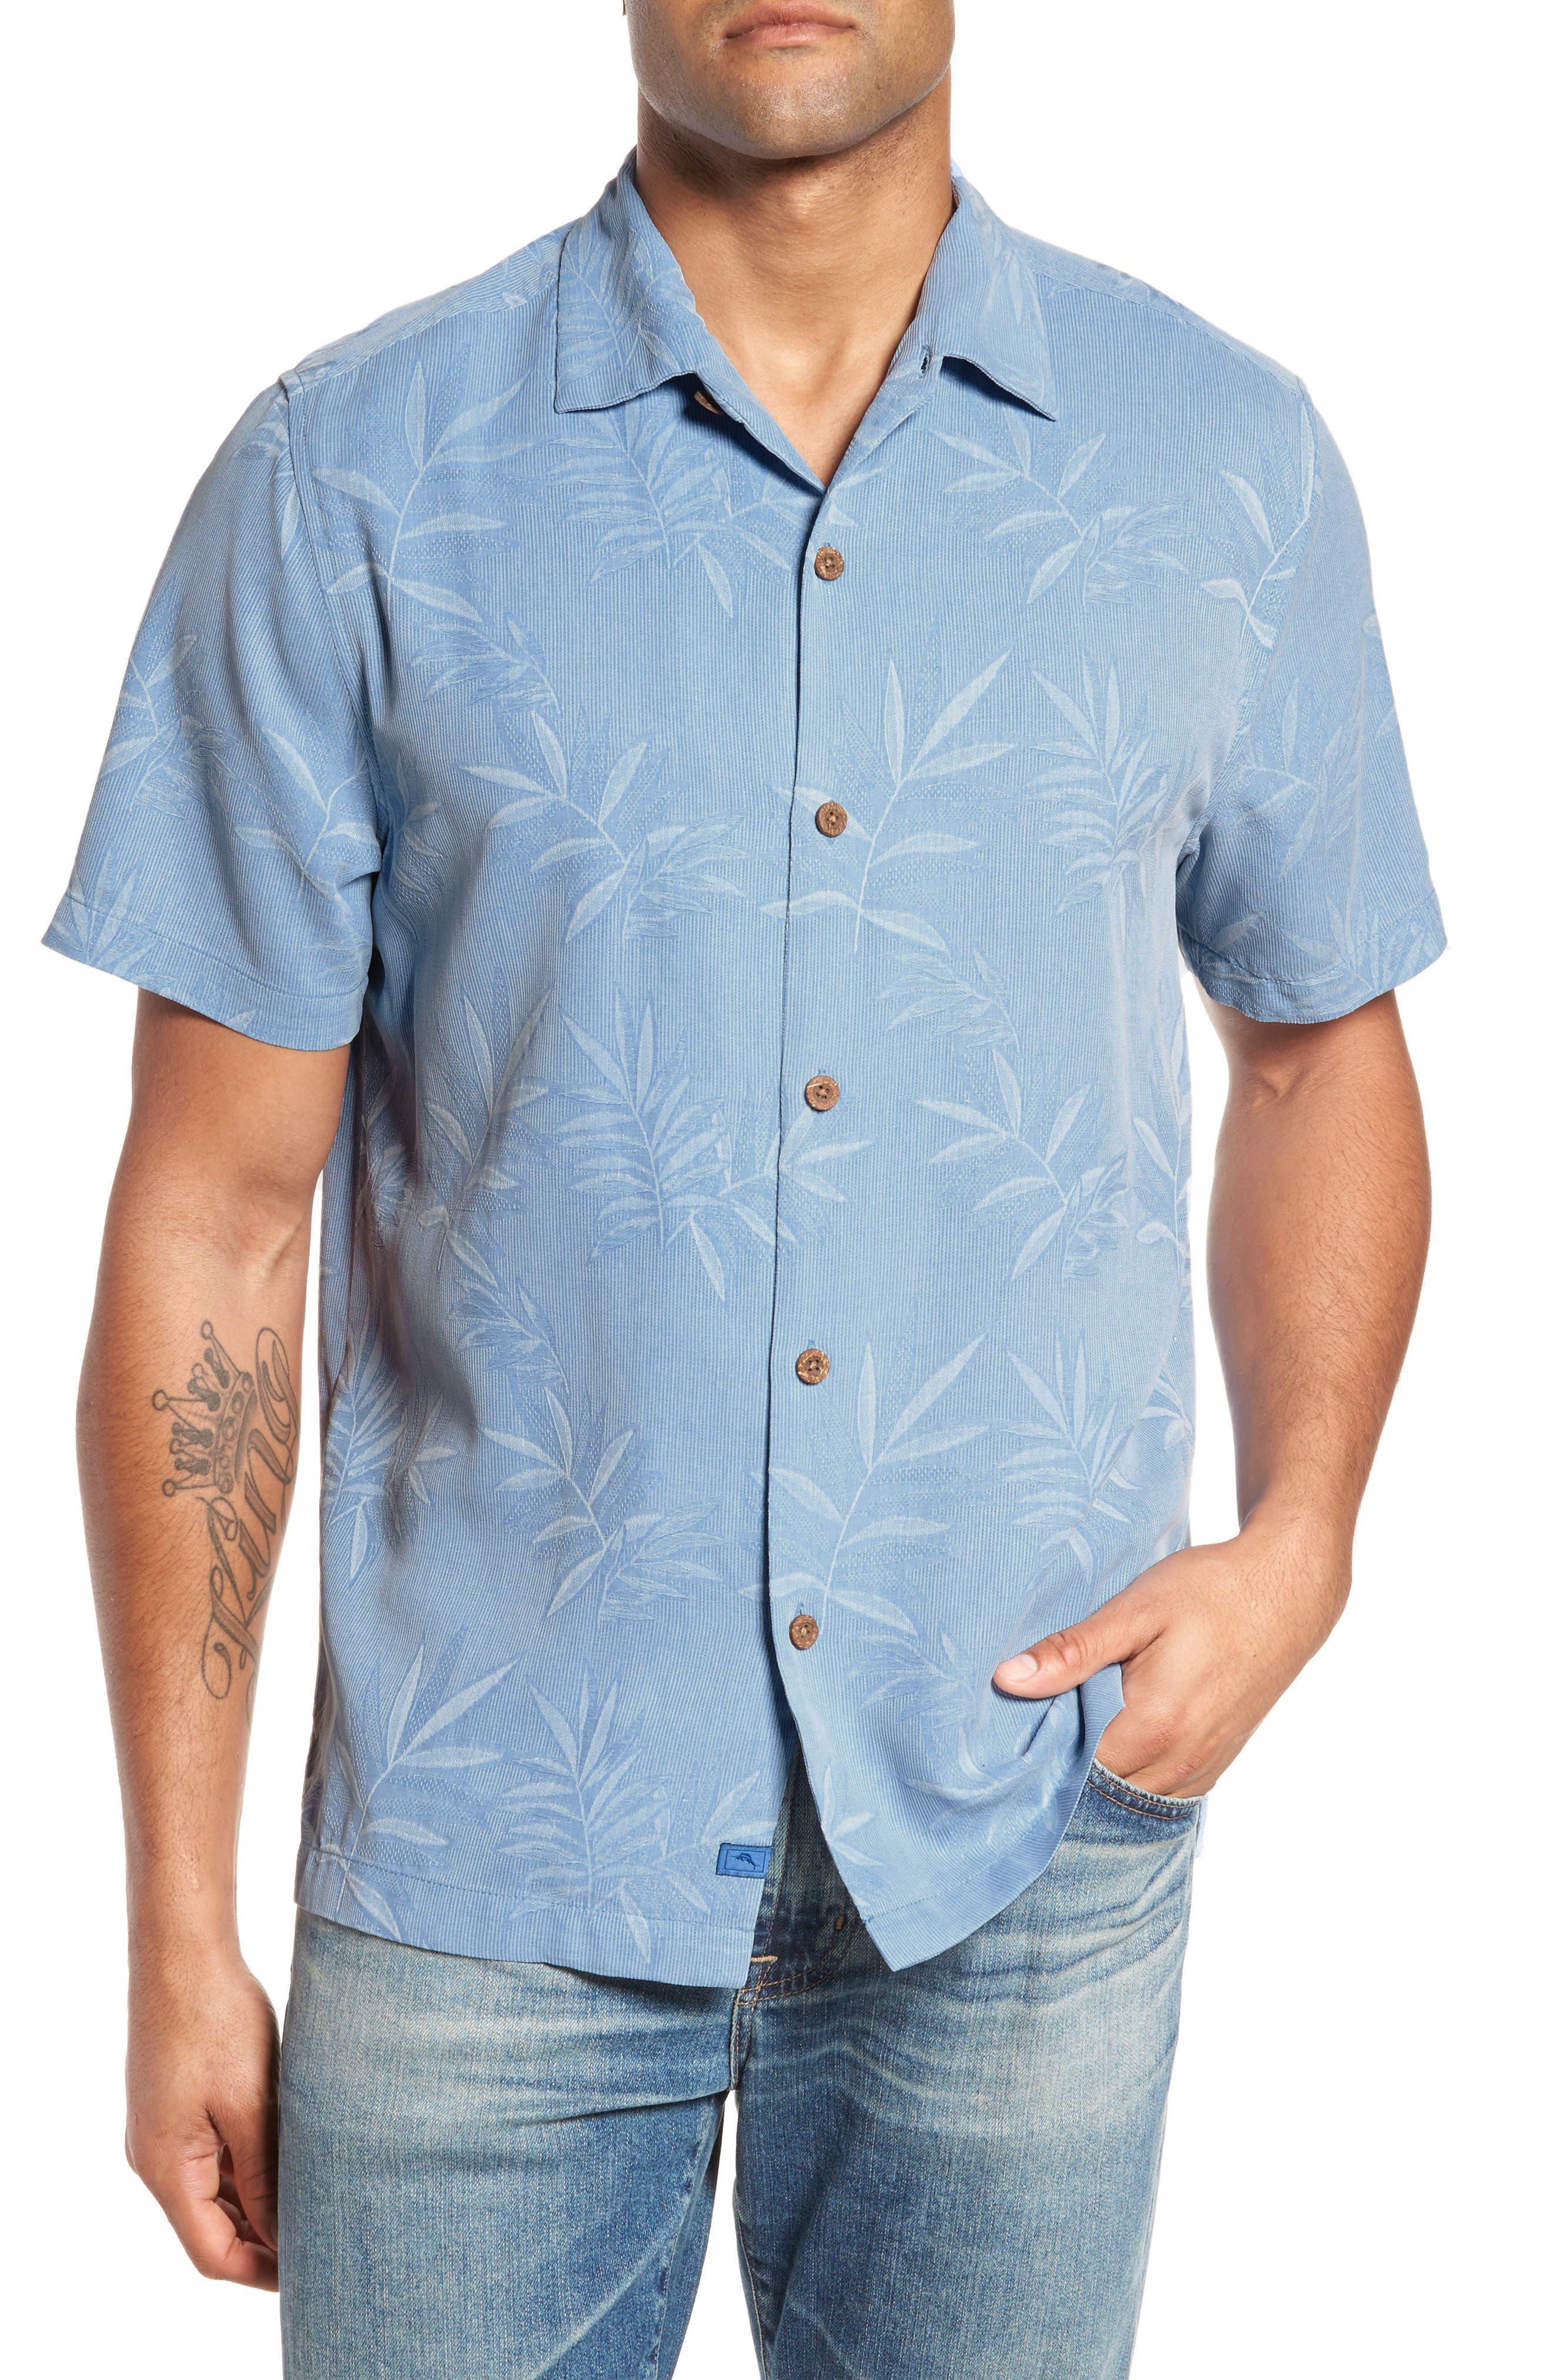 TOMMY BAHAMA,                             Luau Floral Silk Shirt,                             Main thumbnail 1, color,                             408